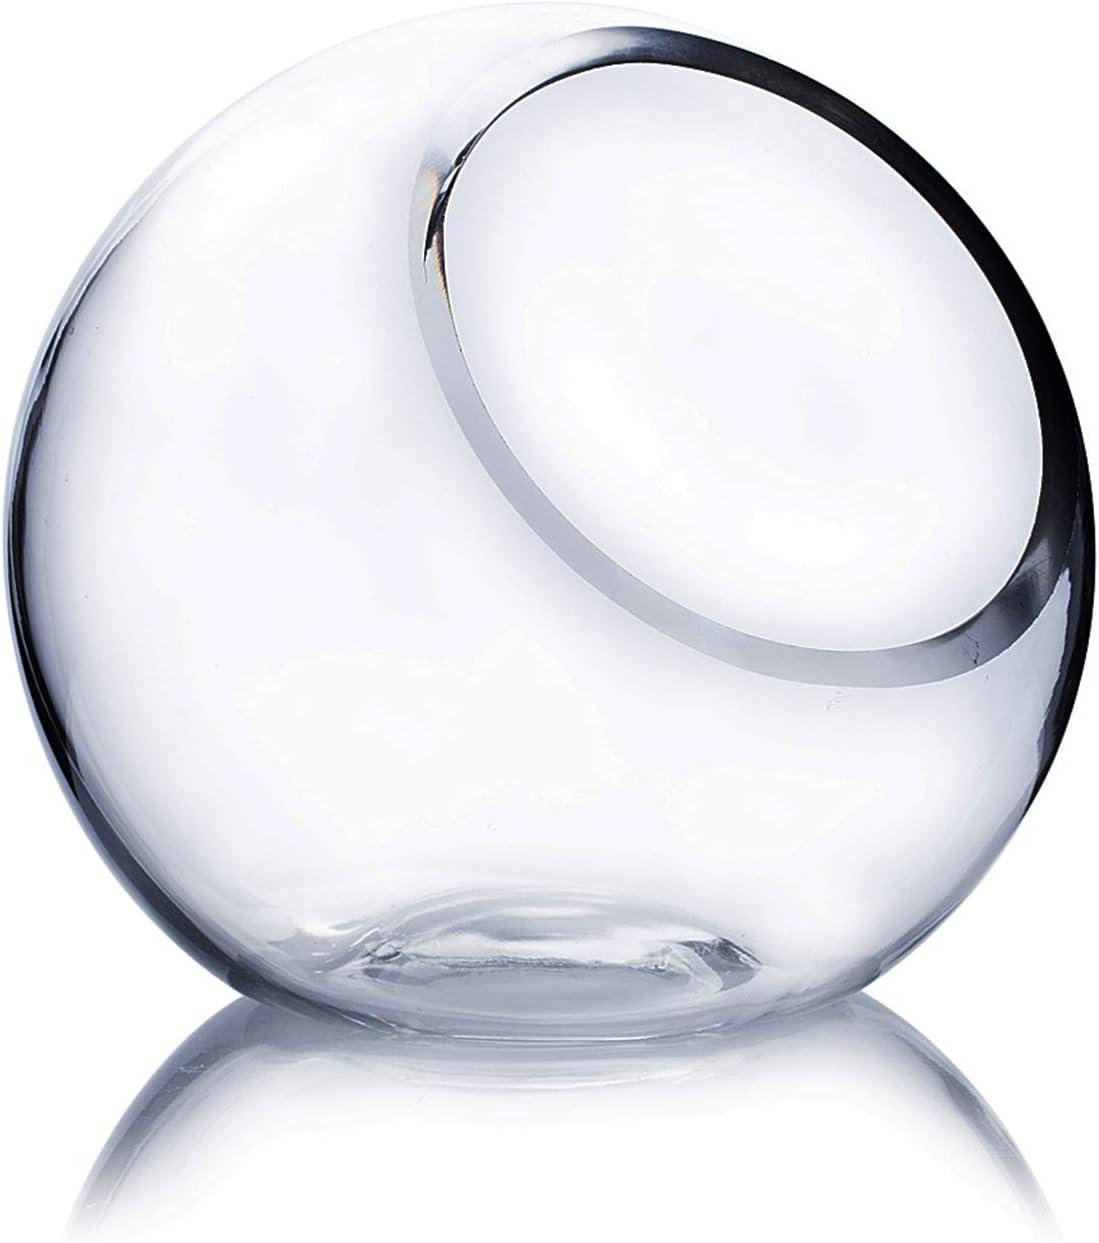 WGV Slant Cut Bowl Glass Vase, Width 5.5